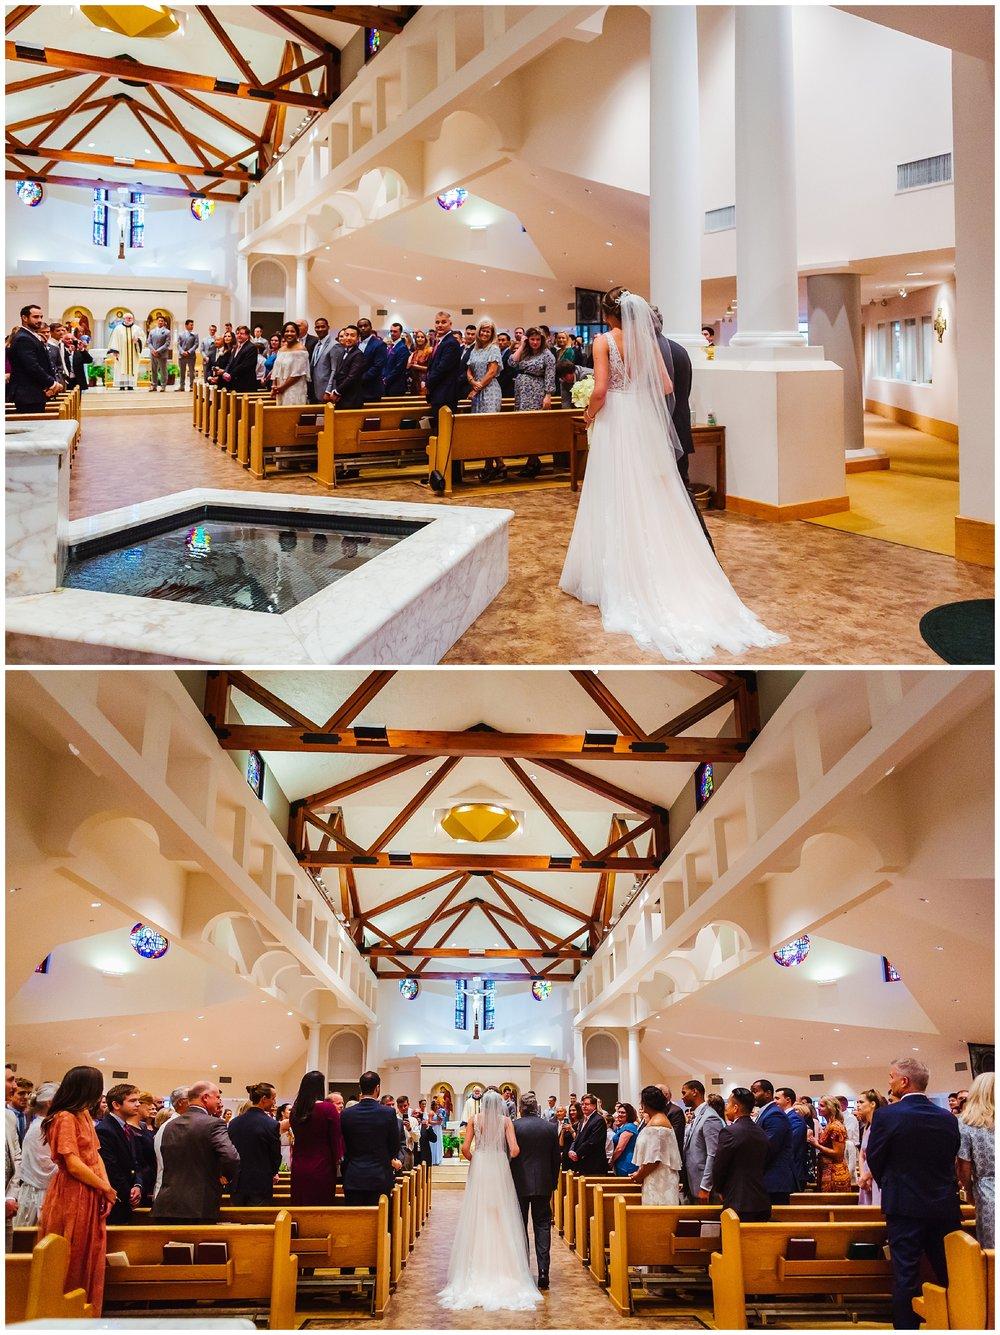 mahaffey-theater-big-military-wedding-st-pete-photographer-blue_0028.jpg